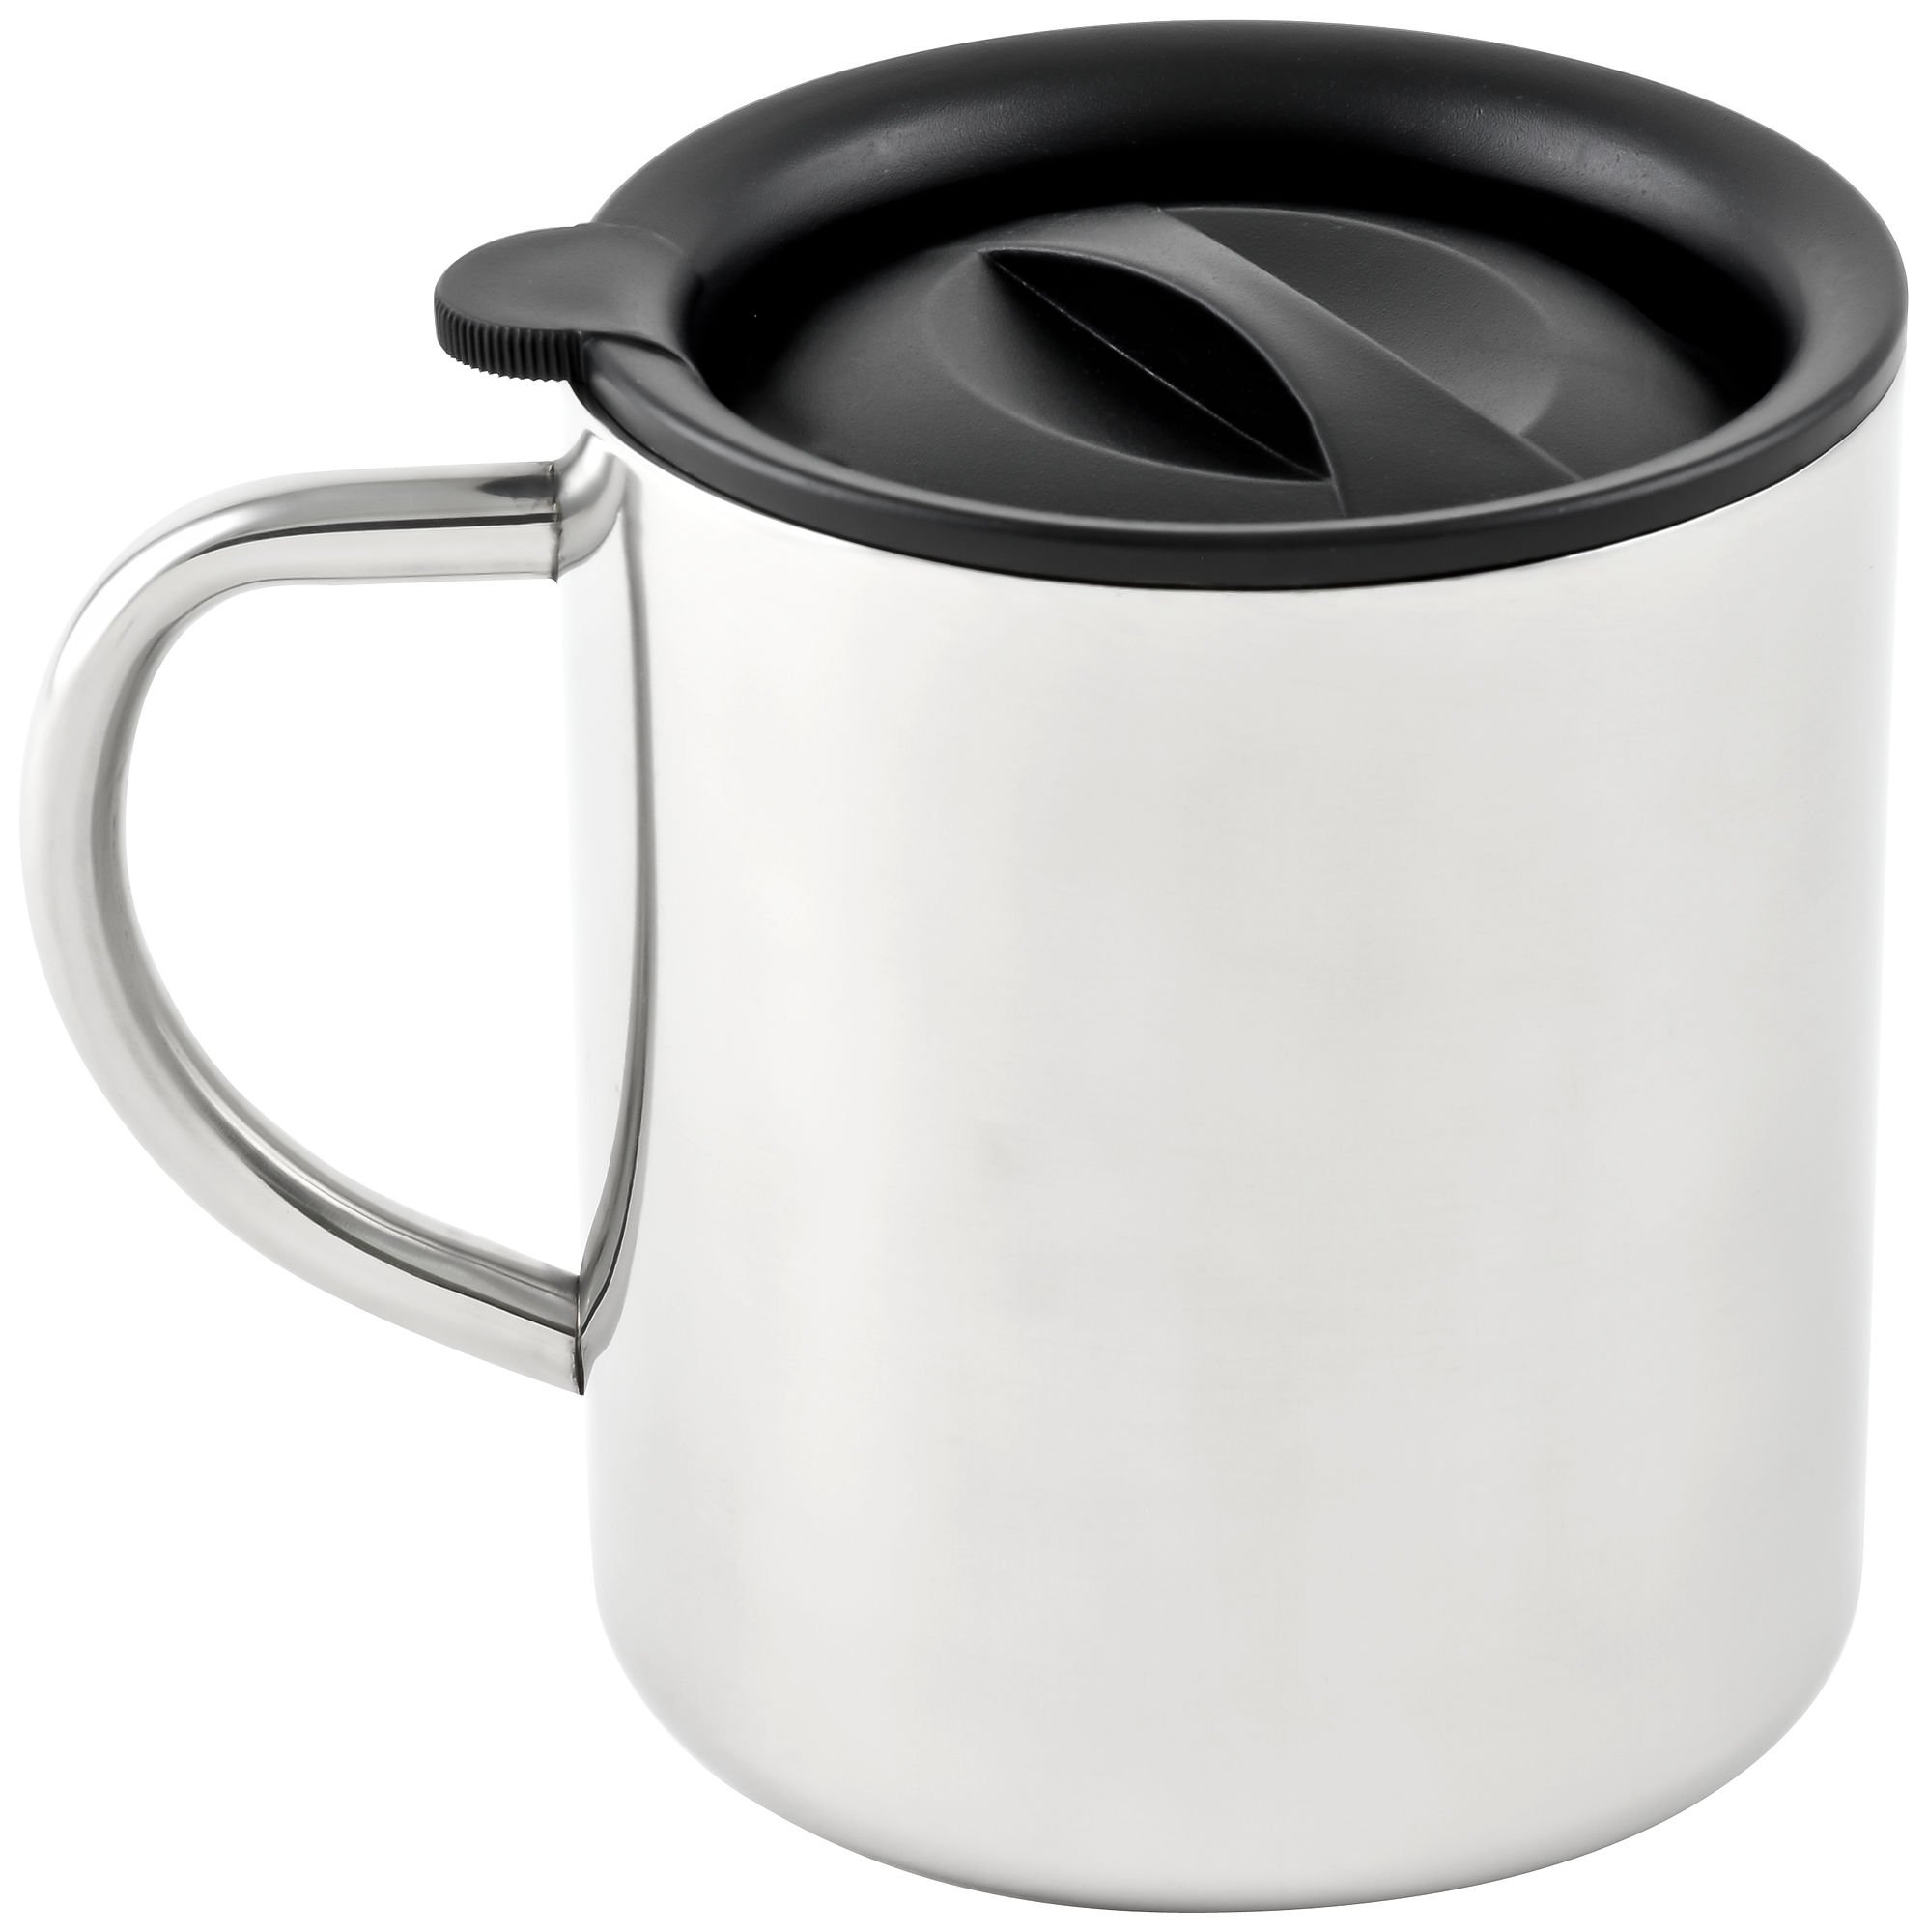 Chinook Timberline Double-Wall Mug with Lid